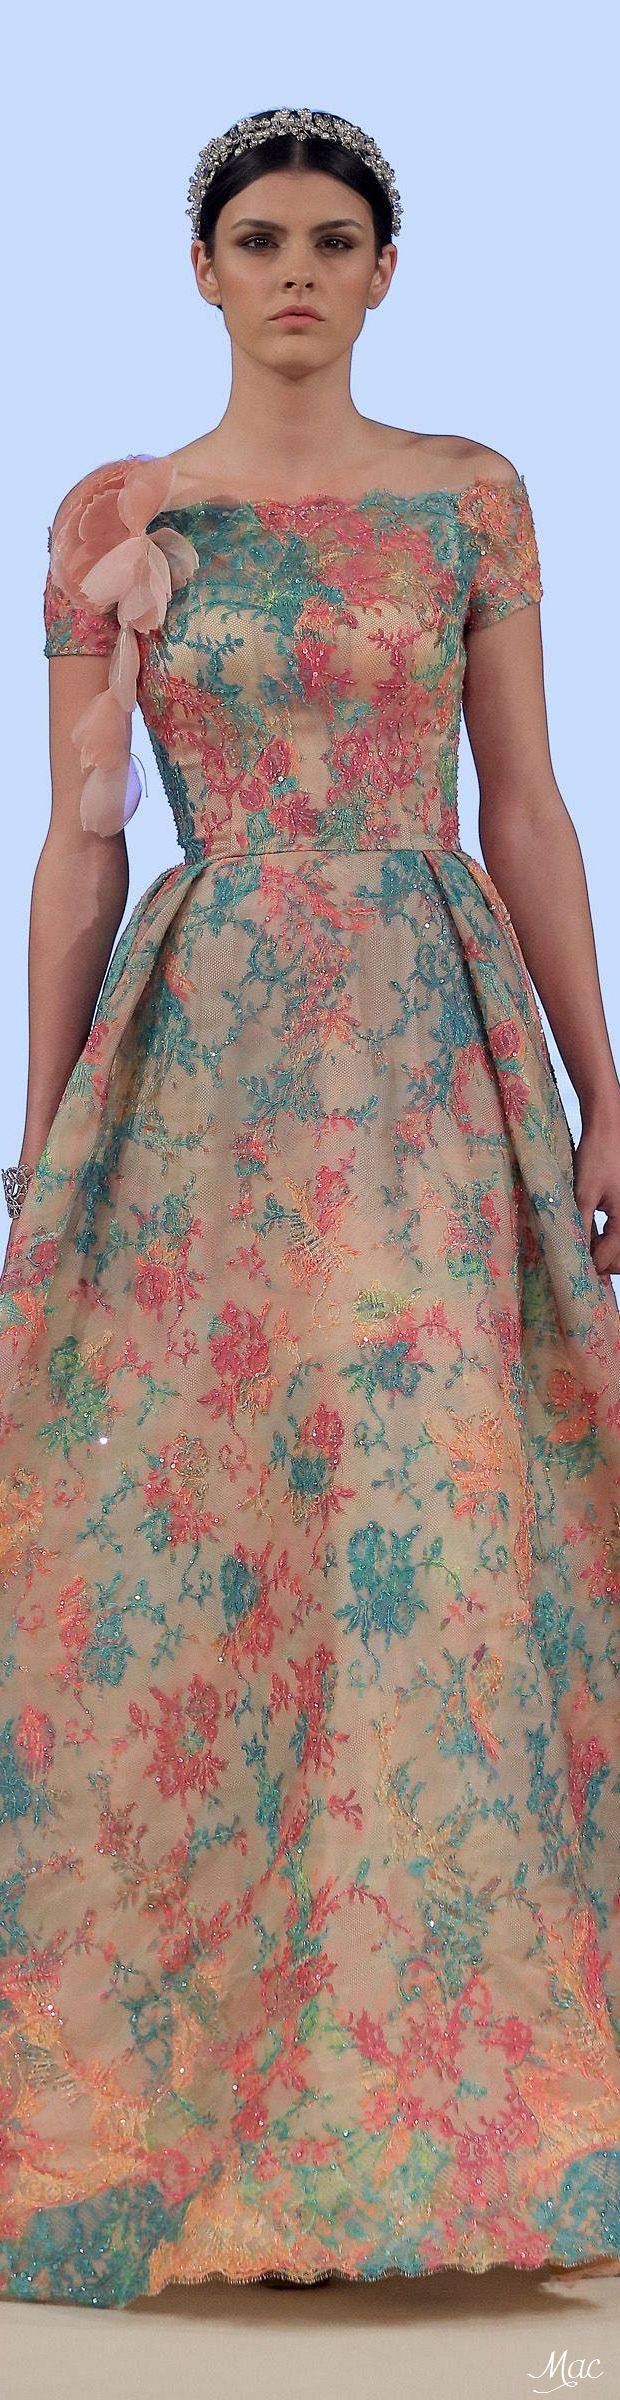 best floral images on pinterest floral fashion dress shoes